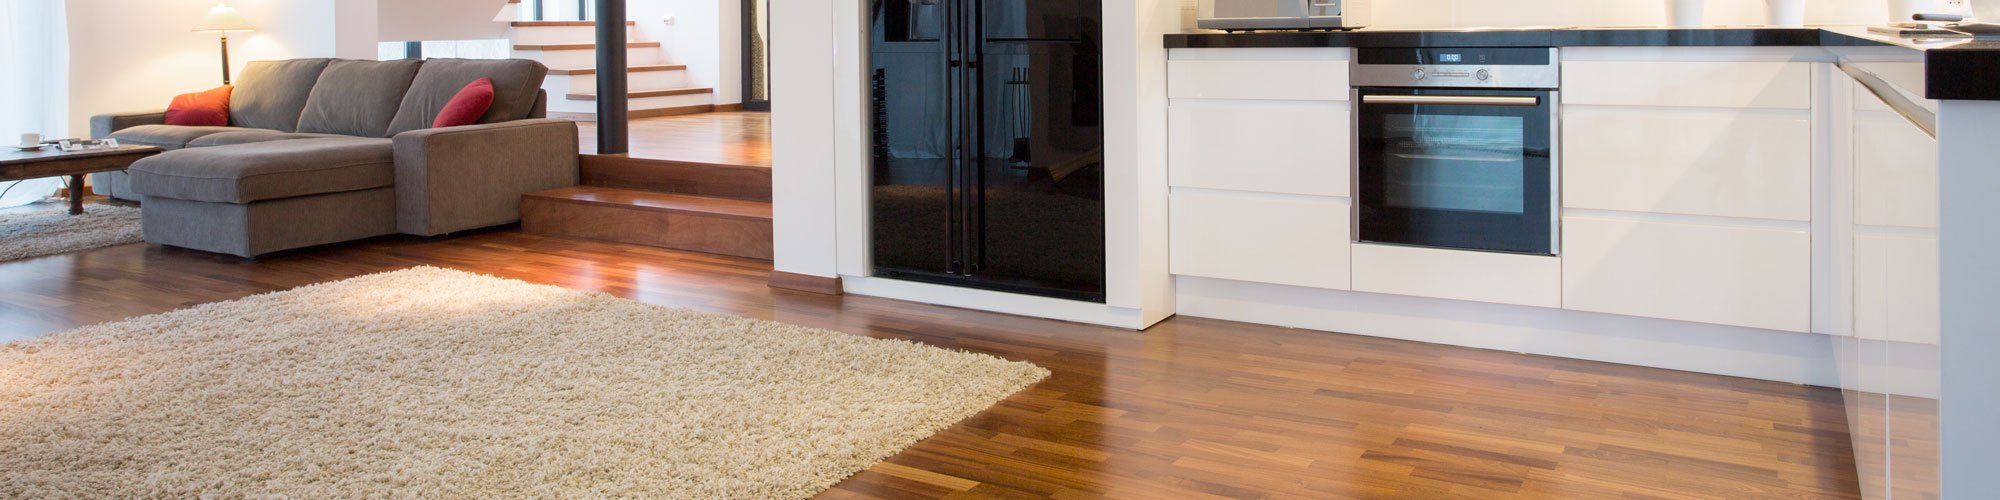 Henfield flooring 01273 911540 sussex for Vinyl flooring enfield